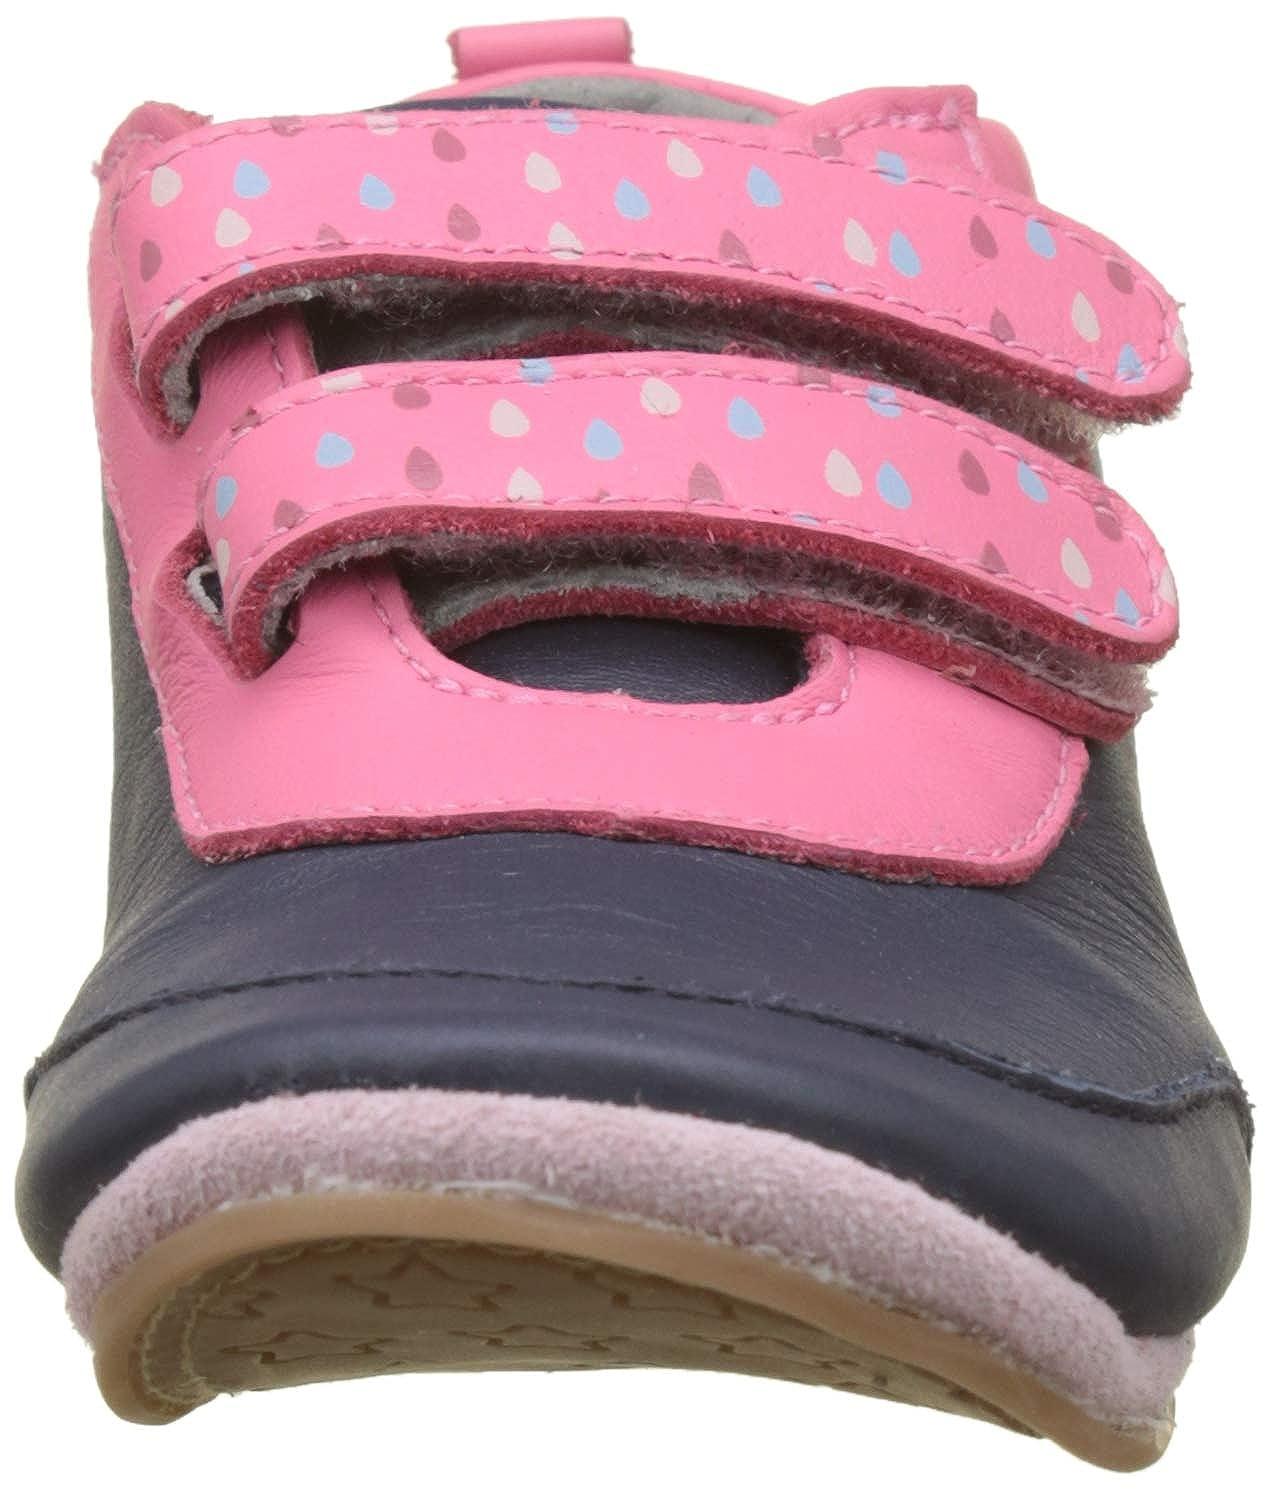 Chaussures de Naissance Mixte b/éb/é Robeez Raining